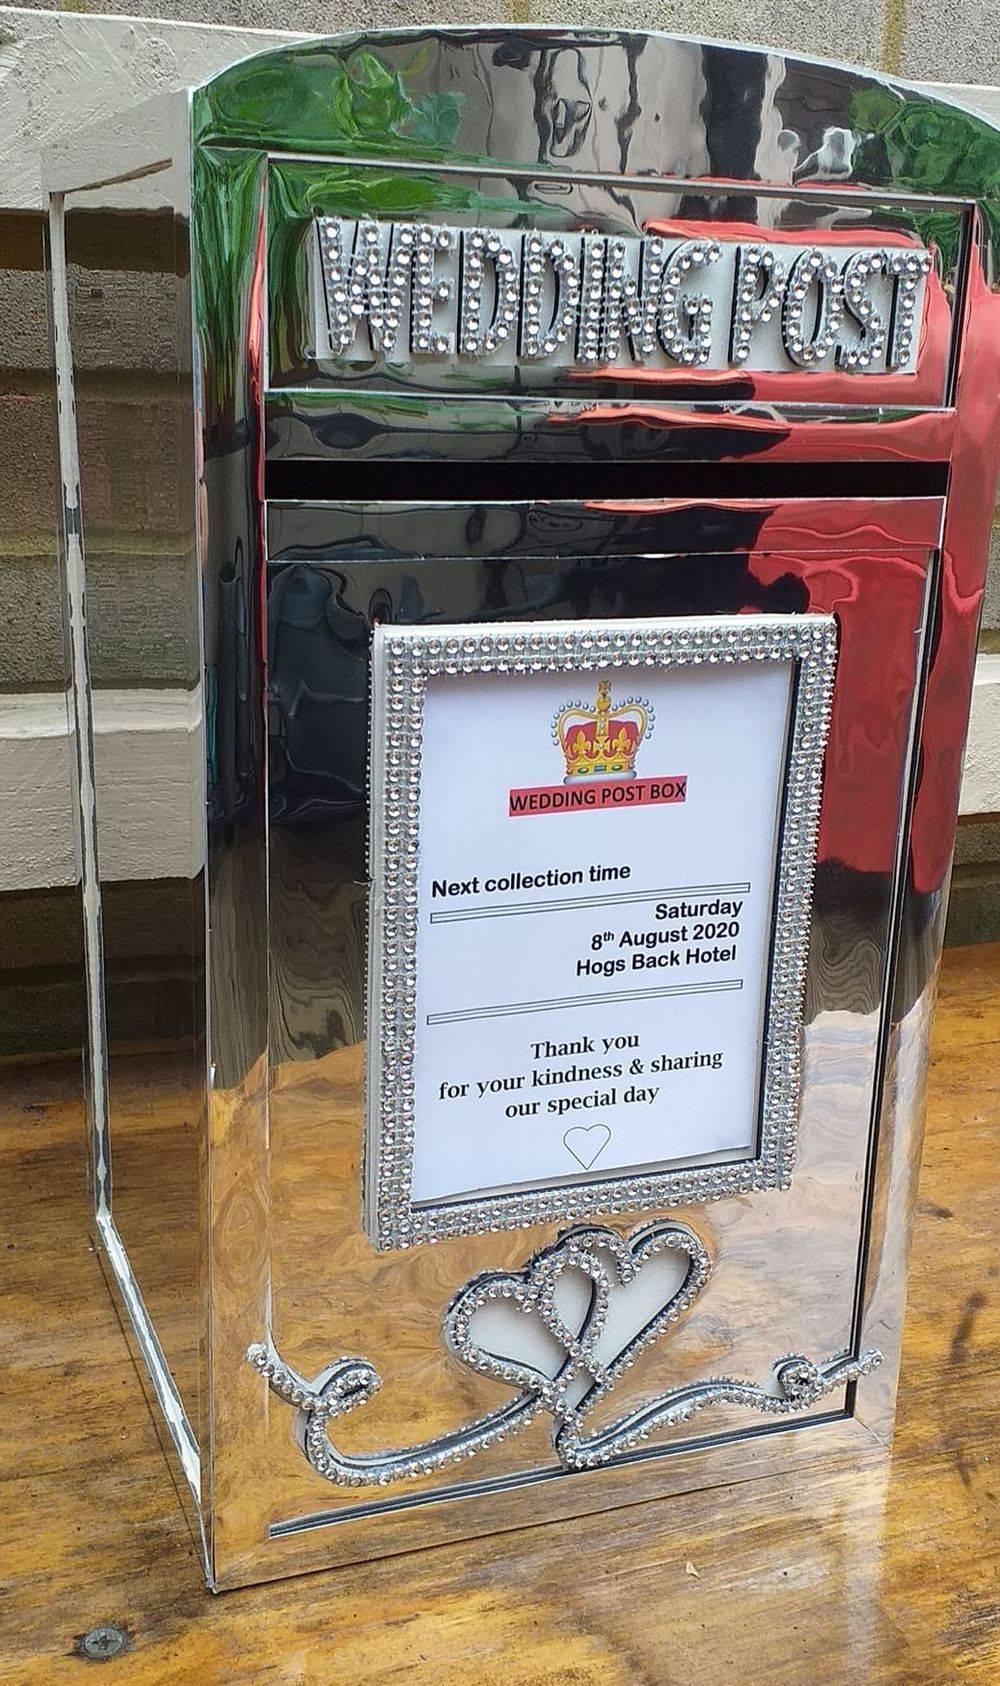 Mirror Post Box Hire, Surrey, Hampshire